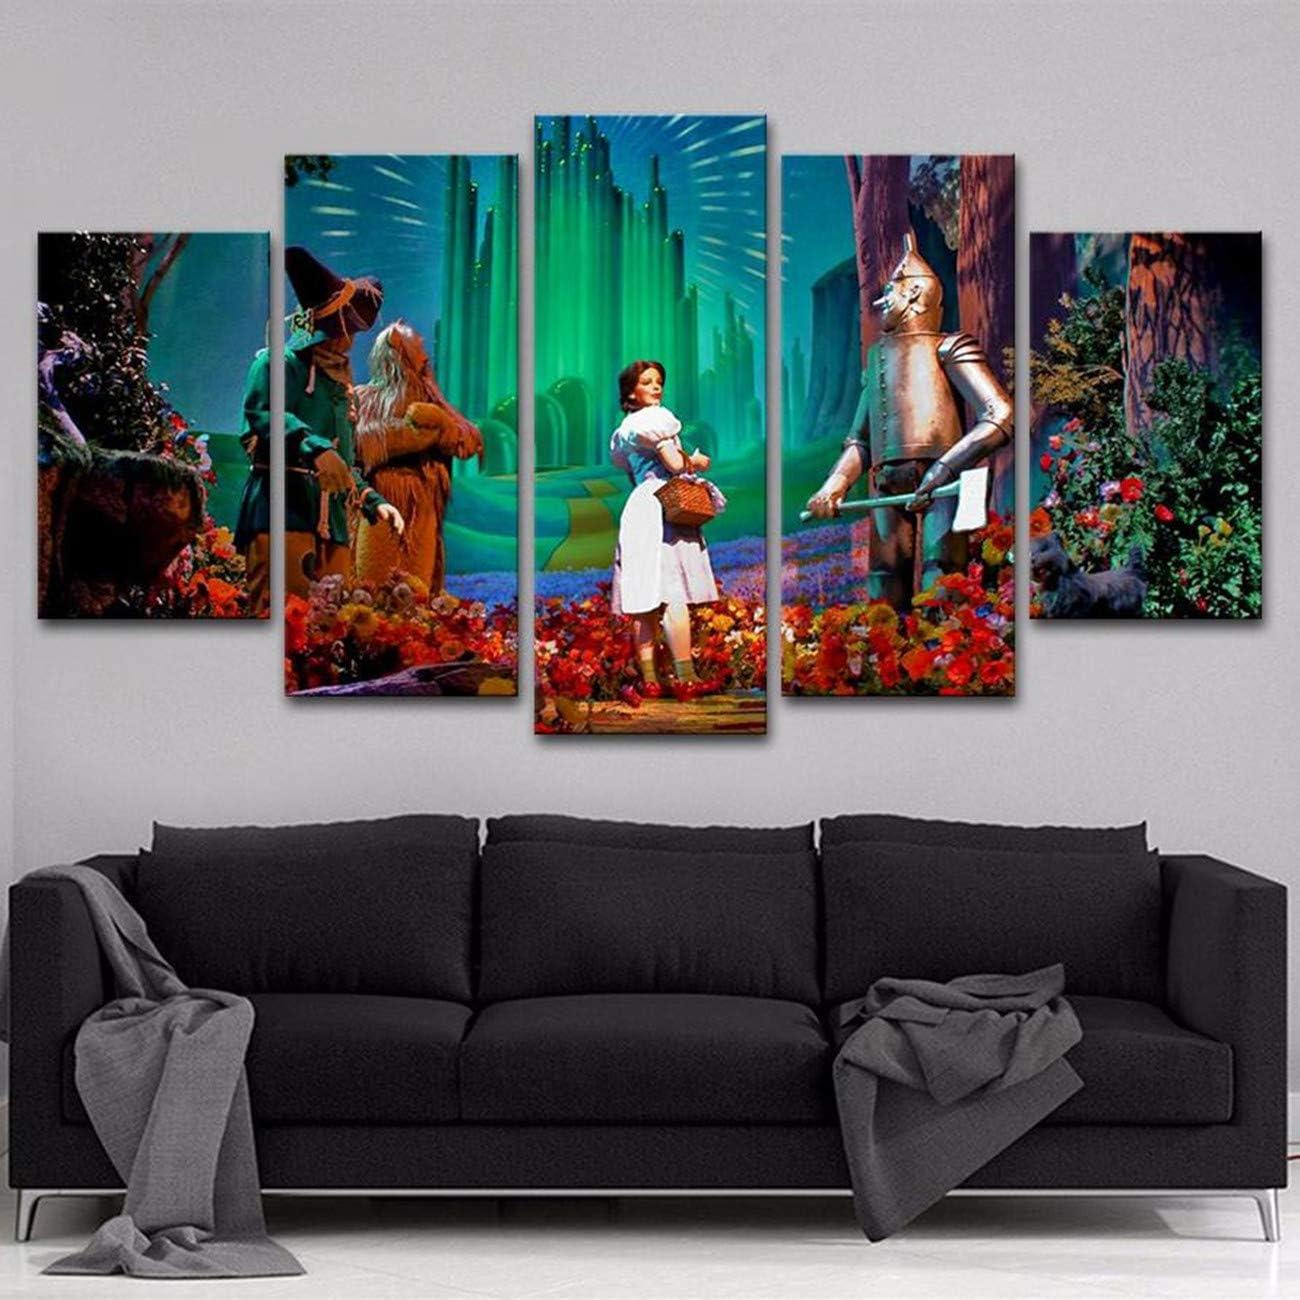 6. Wizard of Oz - 5 Panel Canvas Print Wall Art